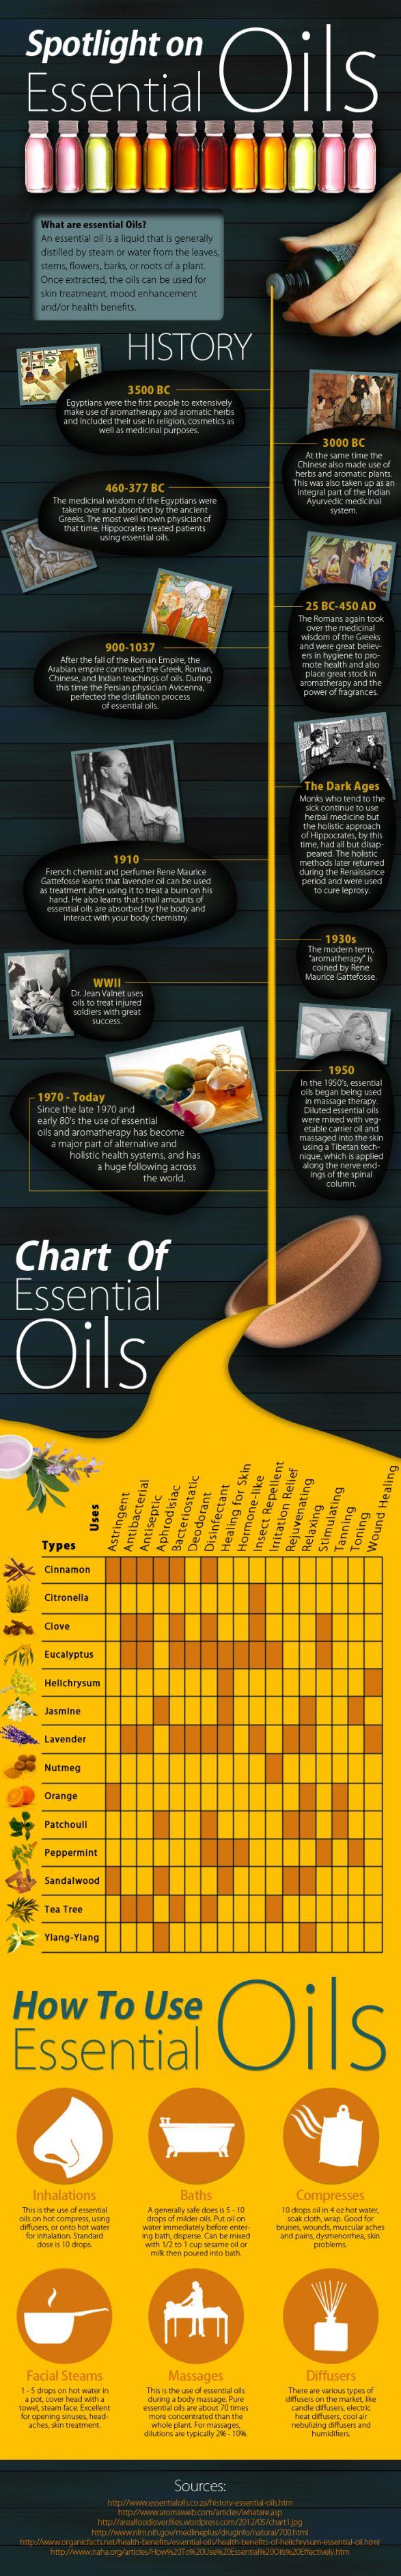 All About Essential Oils #essentialoils